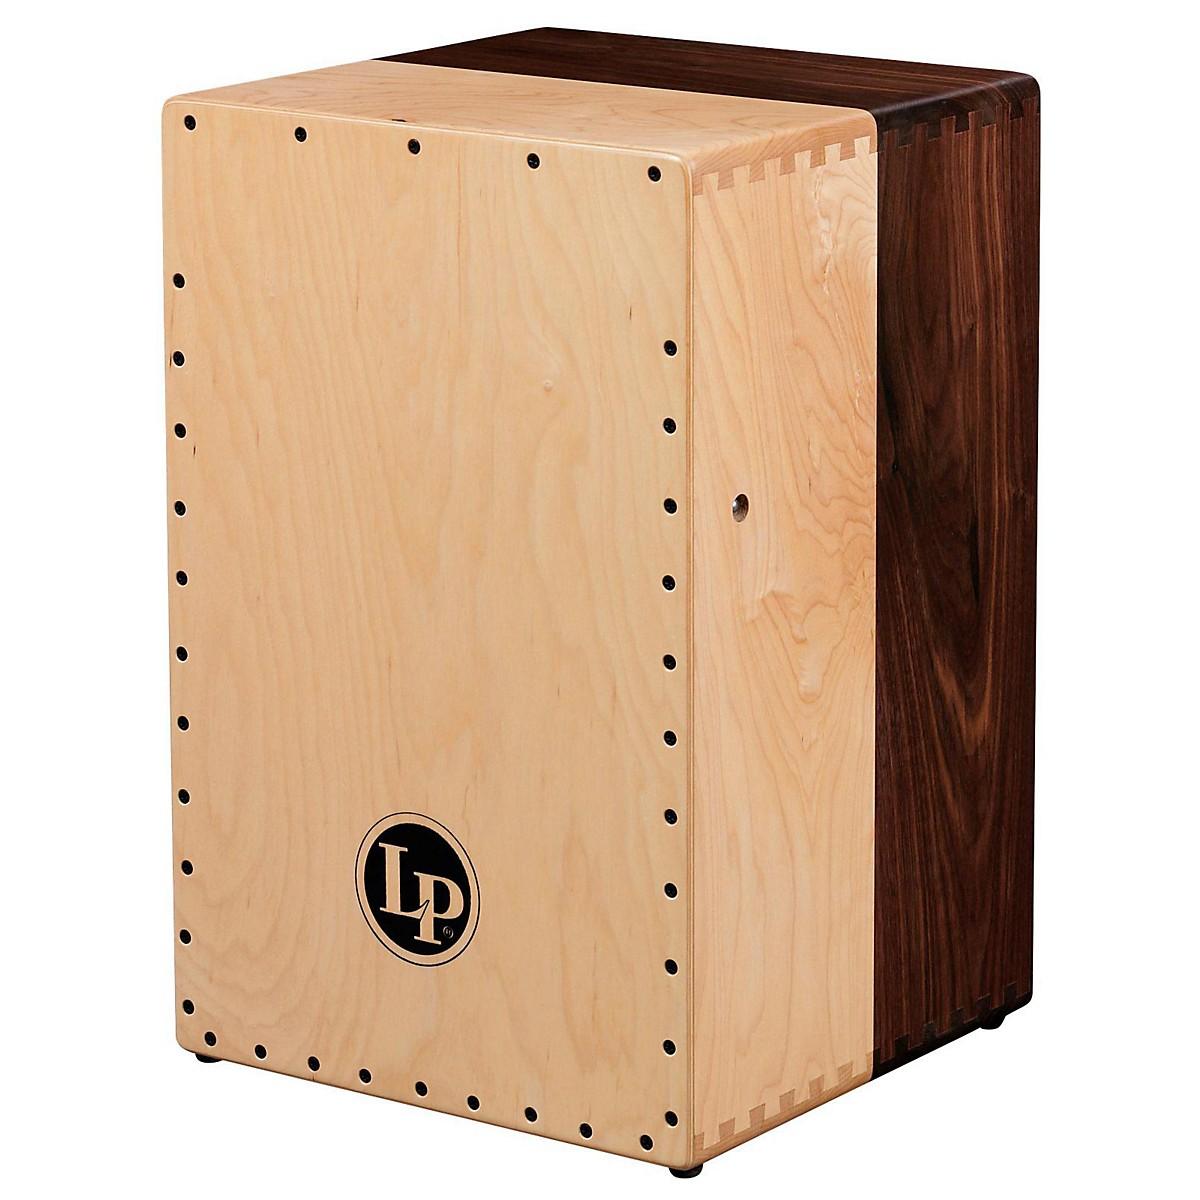 LP Americana Solid Black Walnut and Solid Hard Maple Cajon